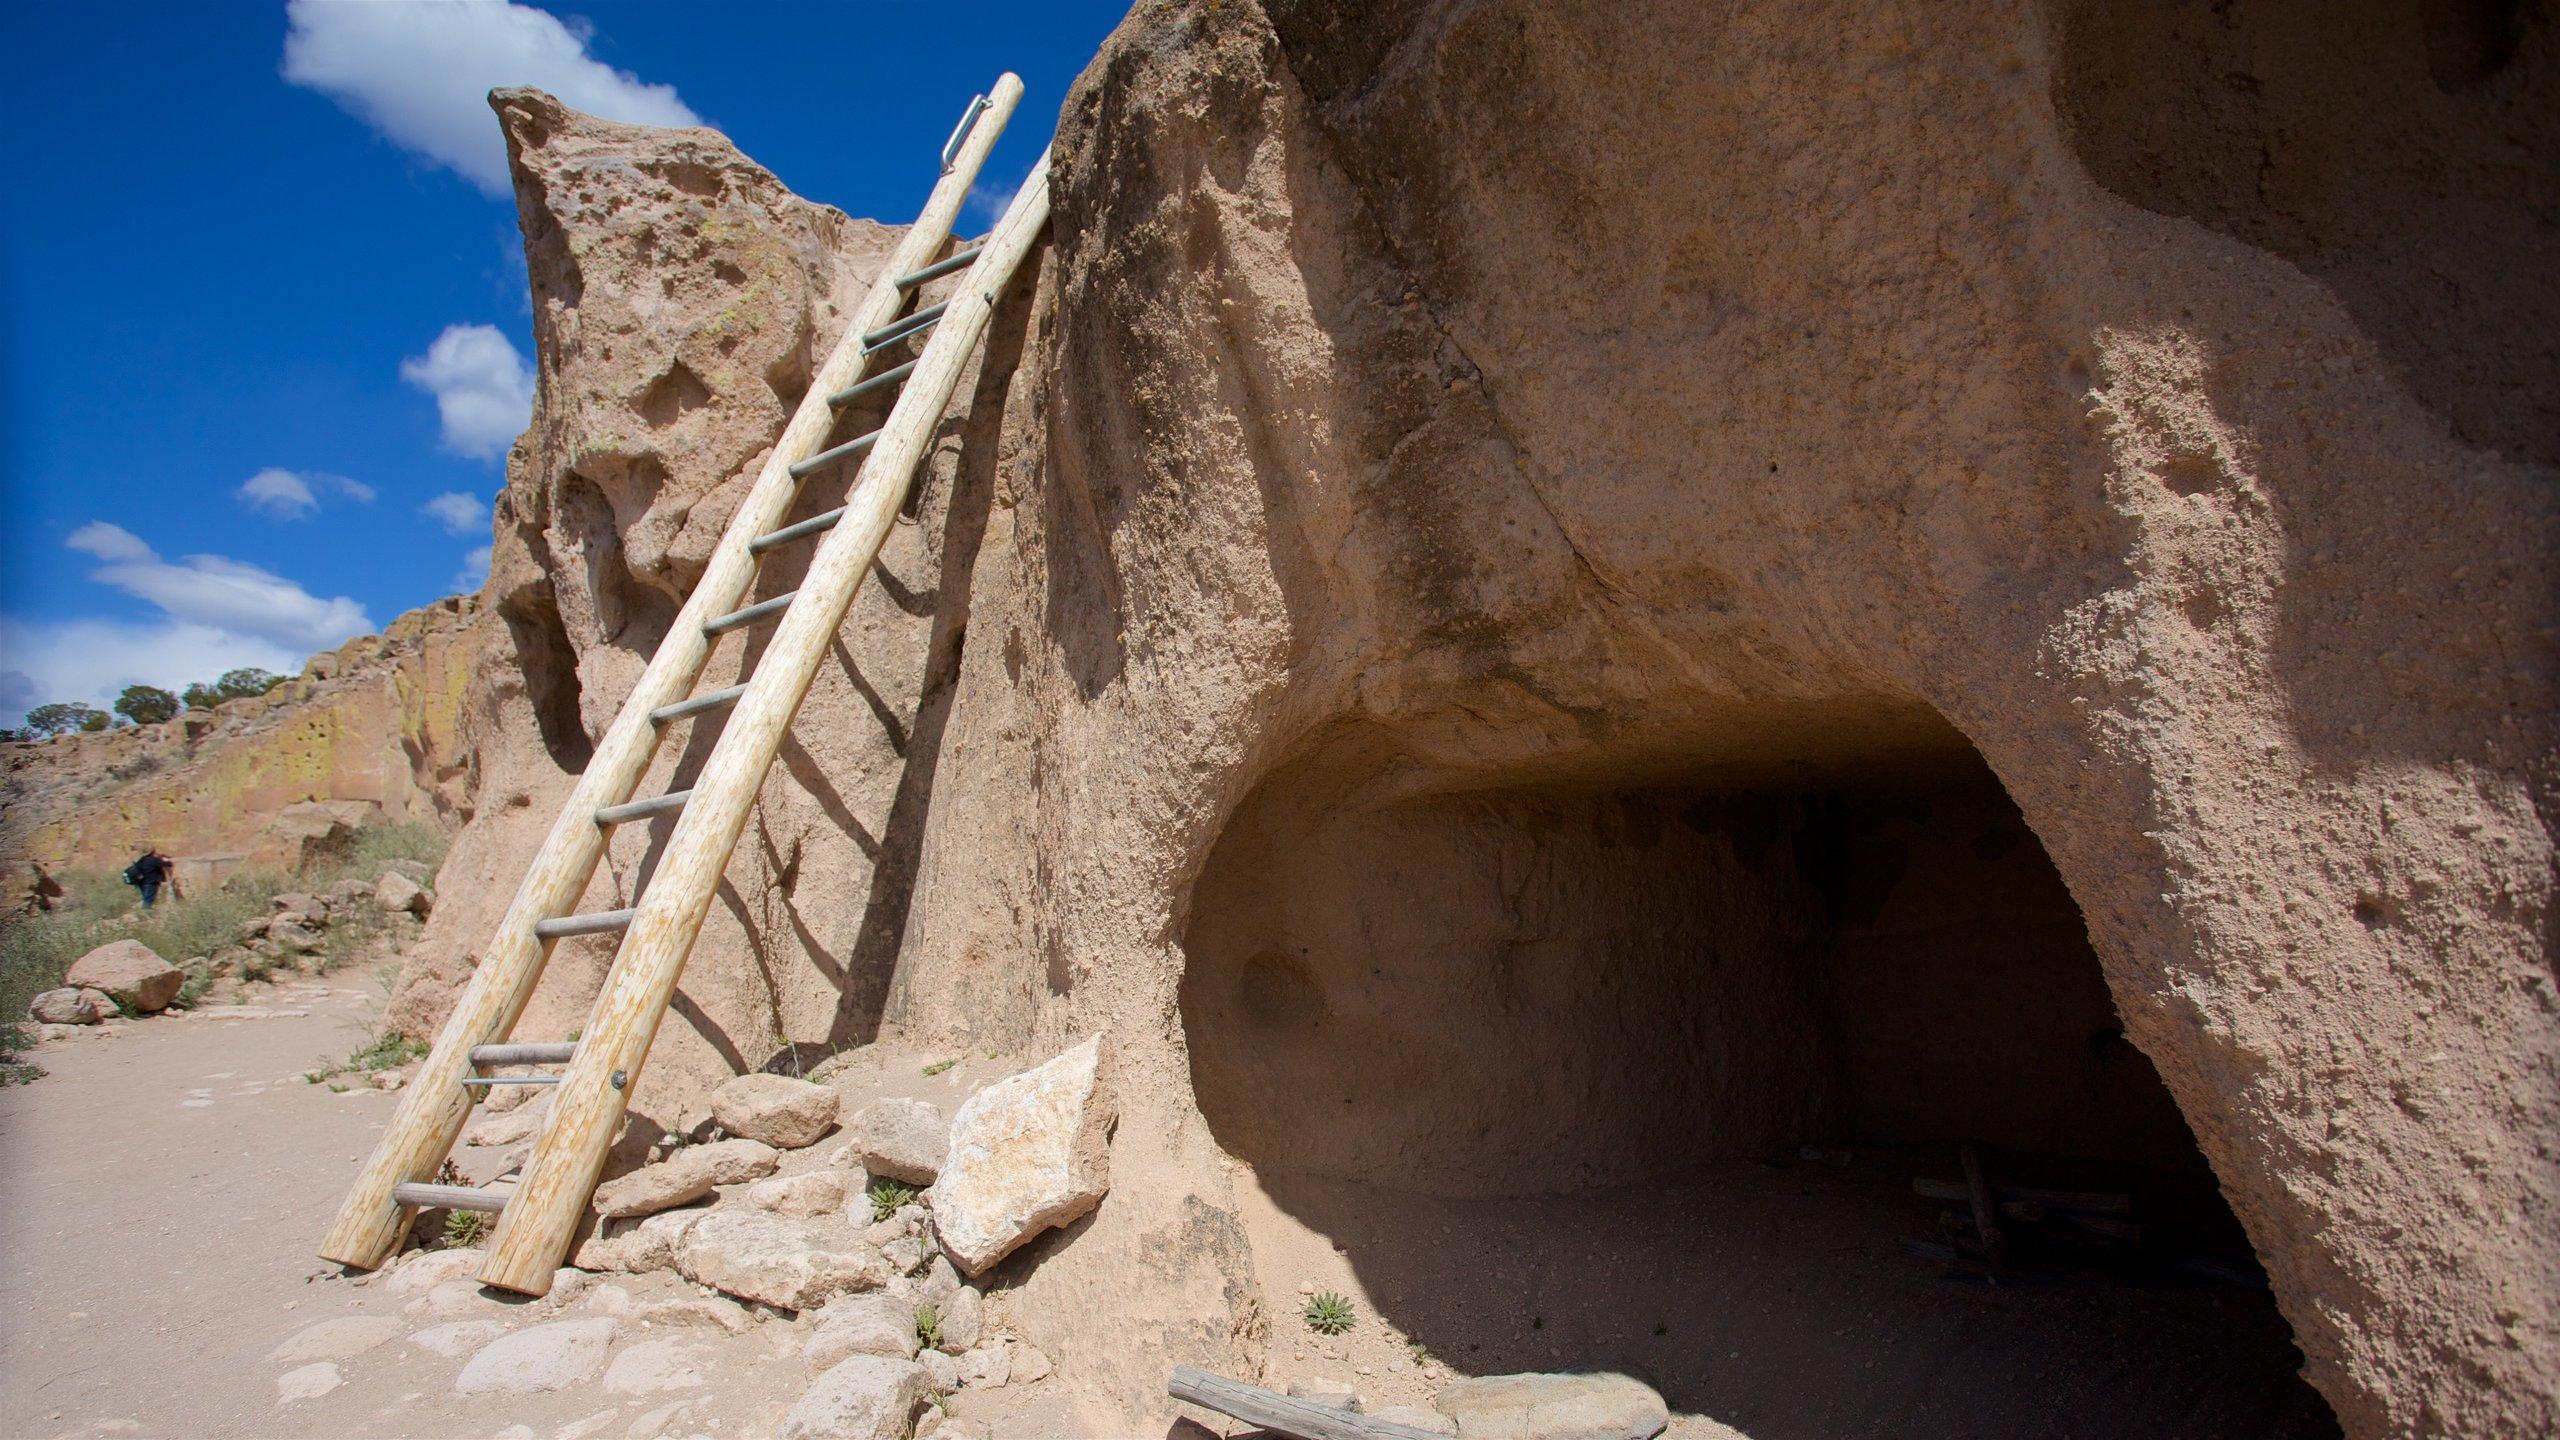 Puye Cliff Dwellings, Espanola, New Mexico, United States of America